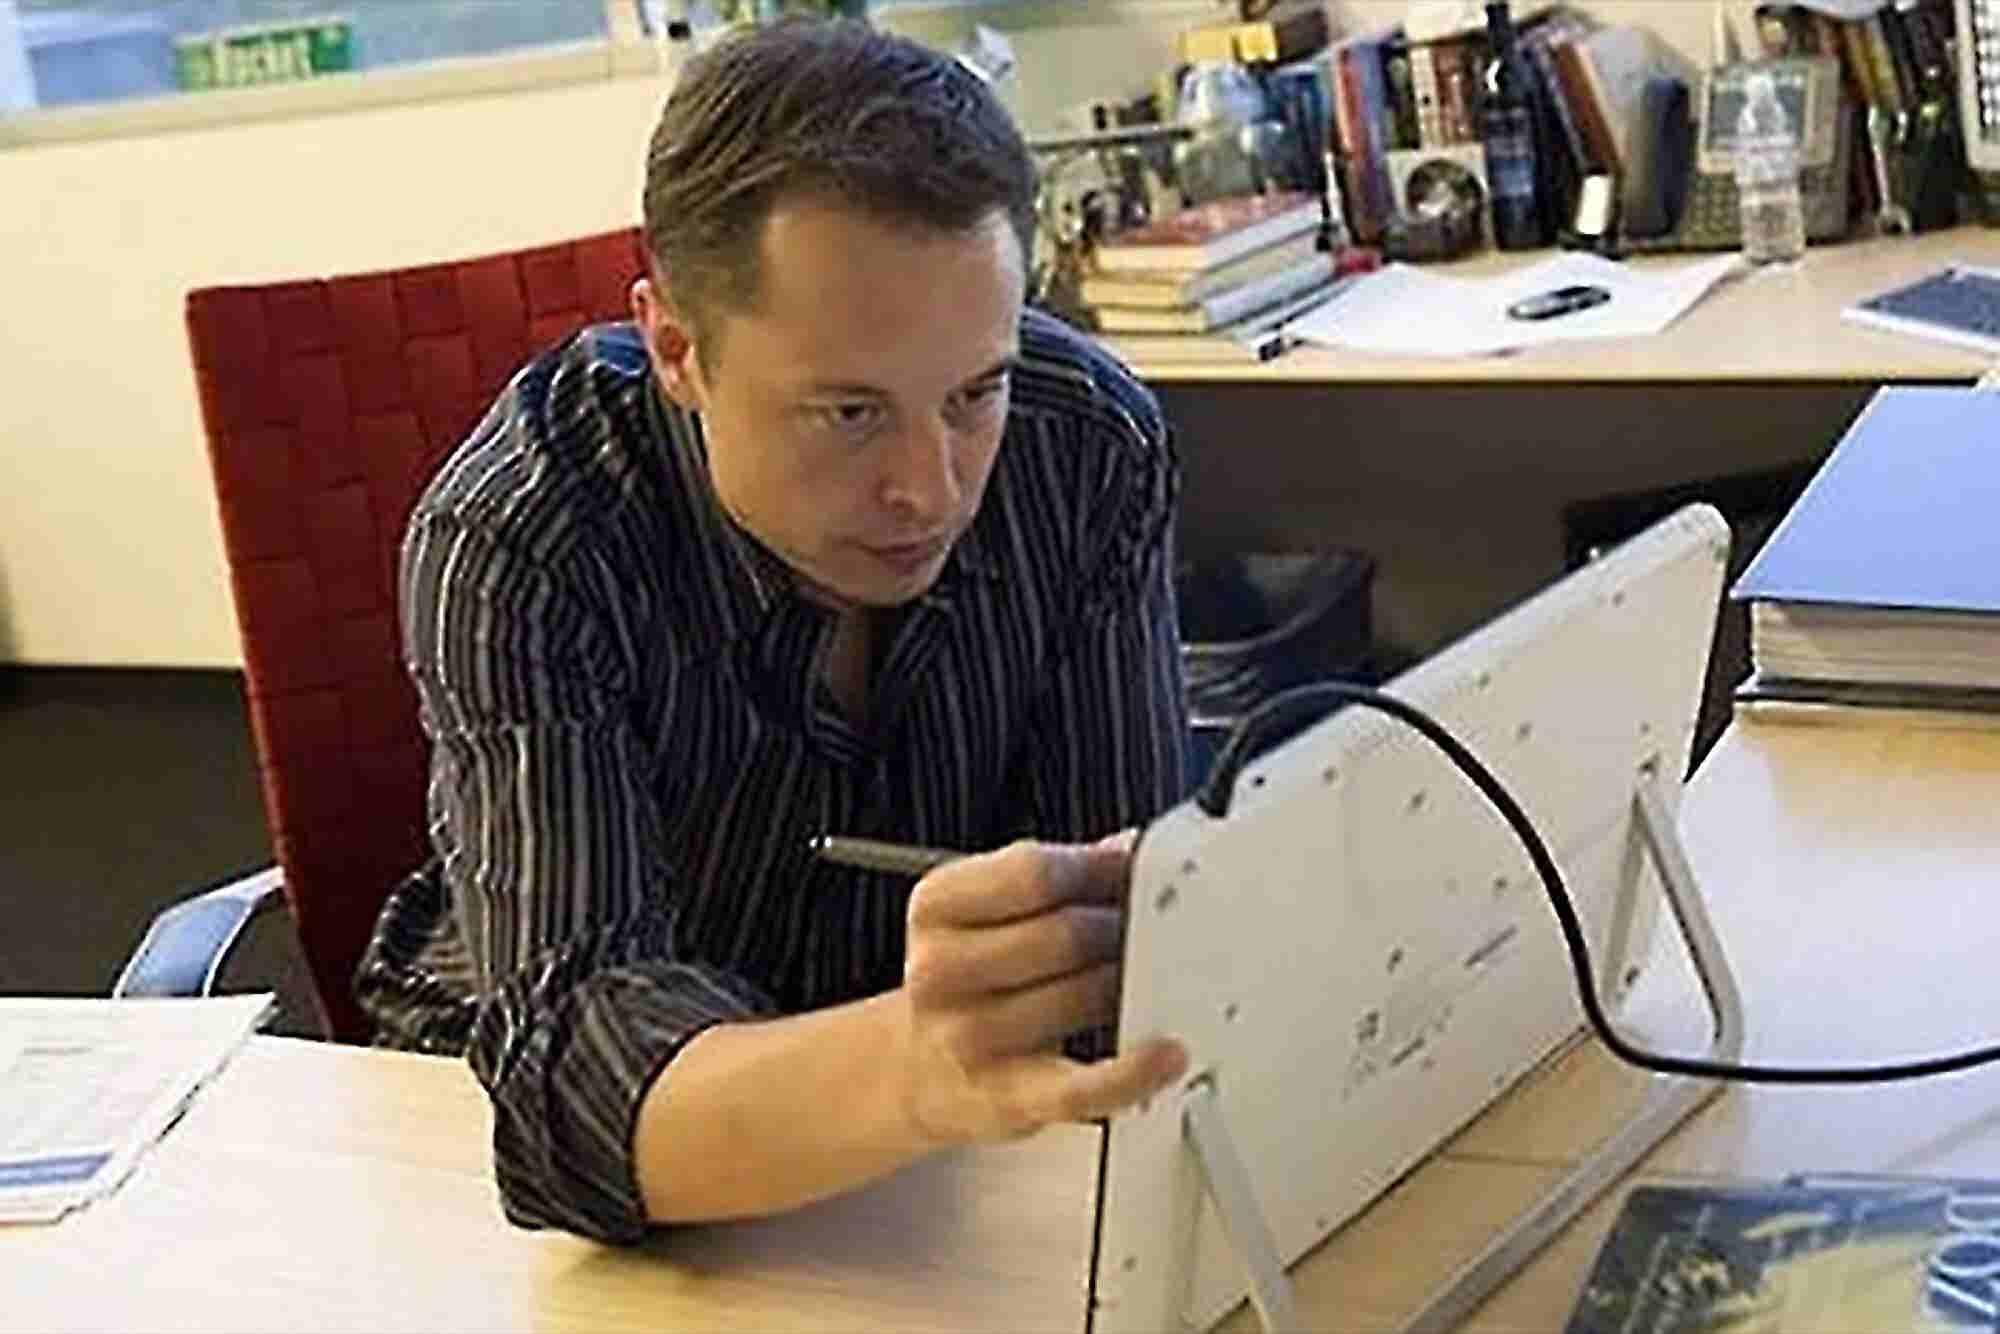 Books Inspiring Mark Zuckerberg, Elon Musk and Other Tech Entrepreneurs